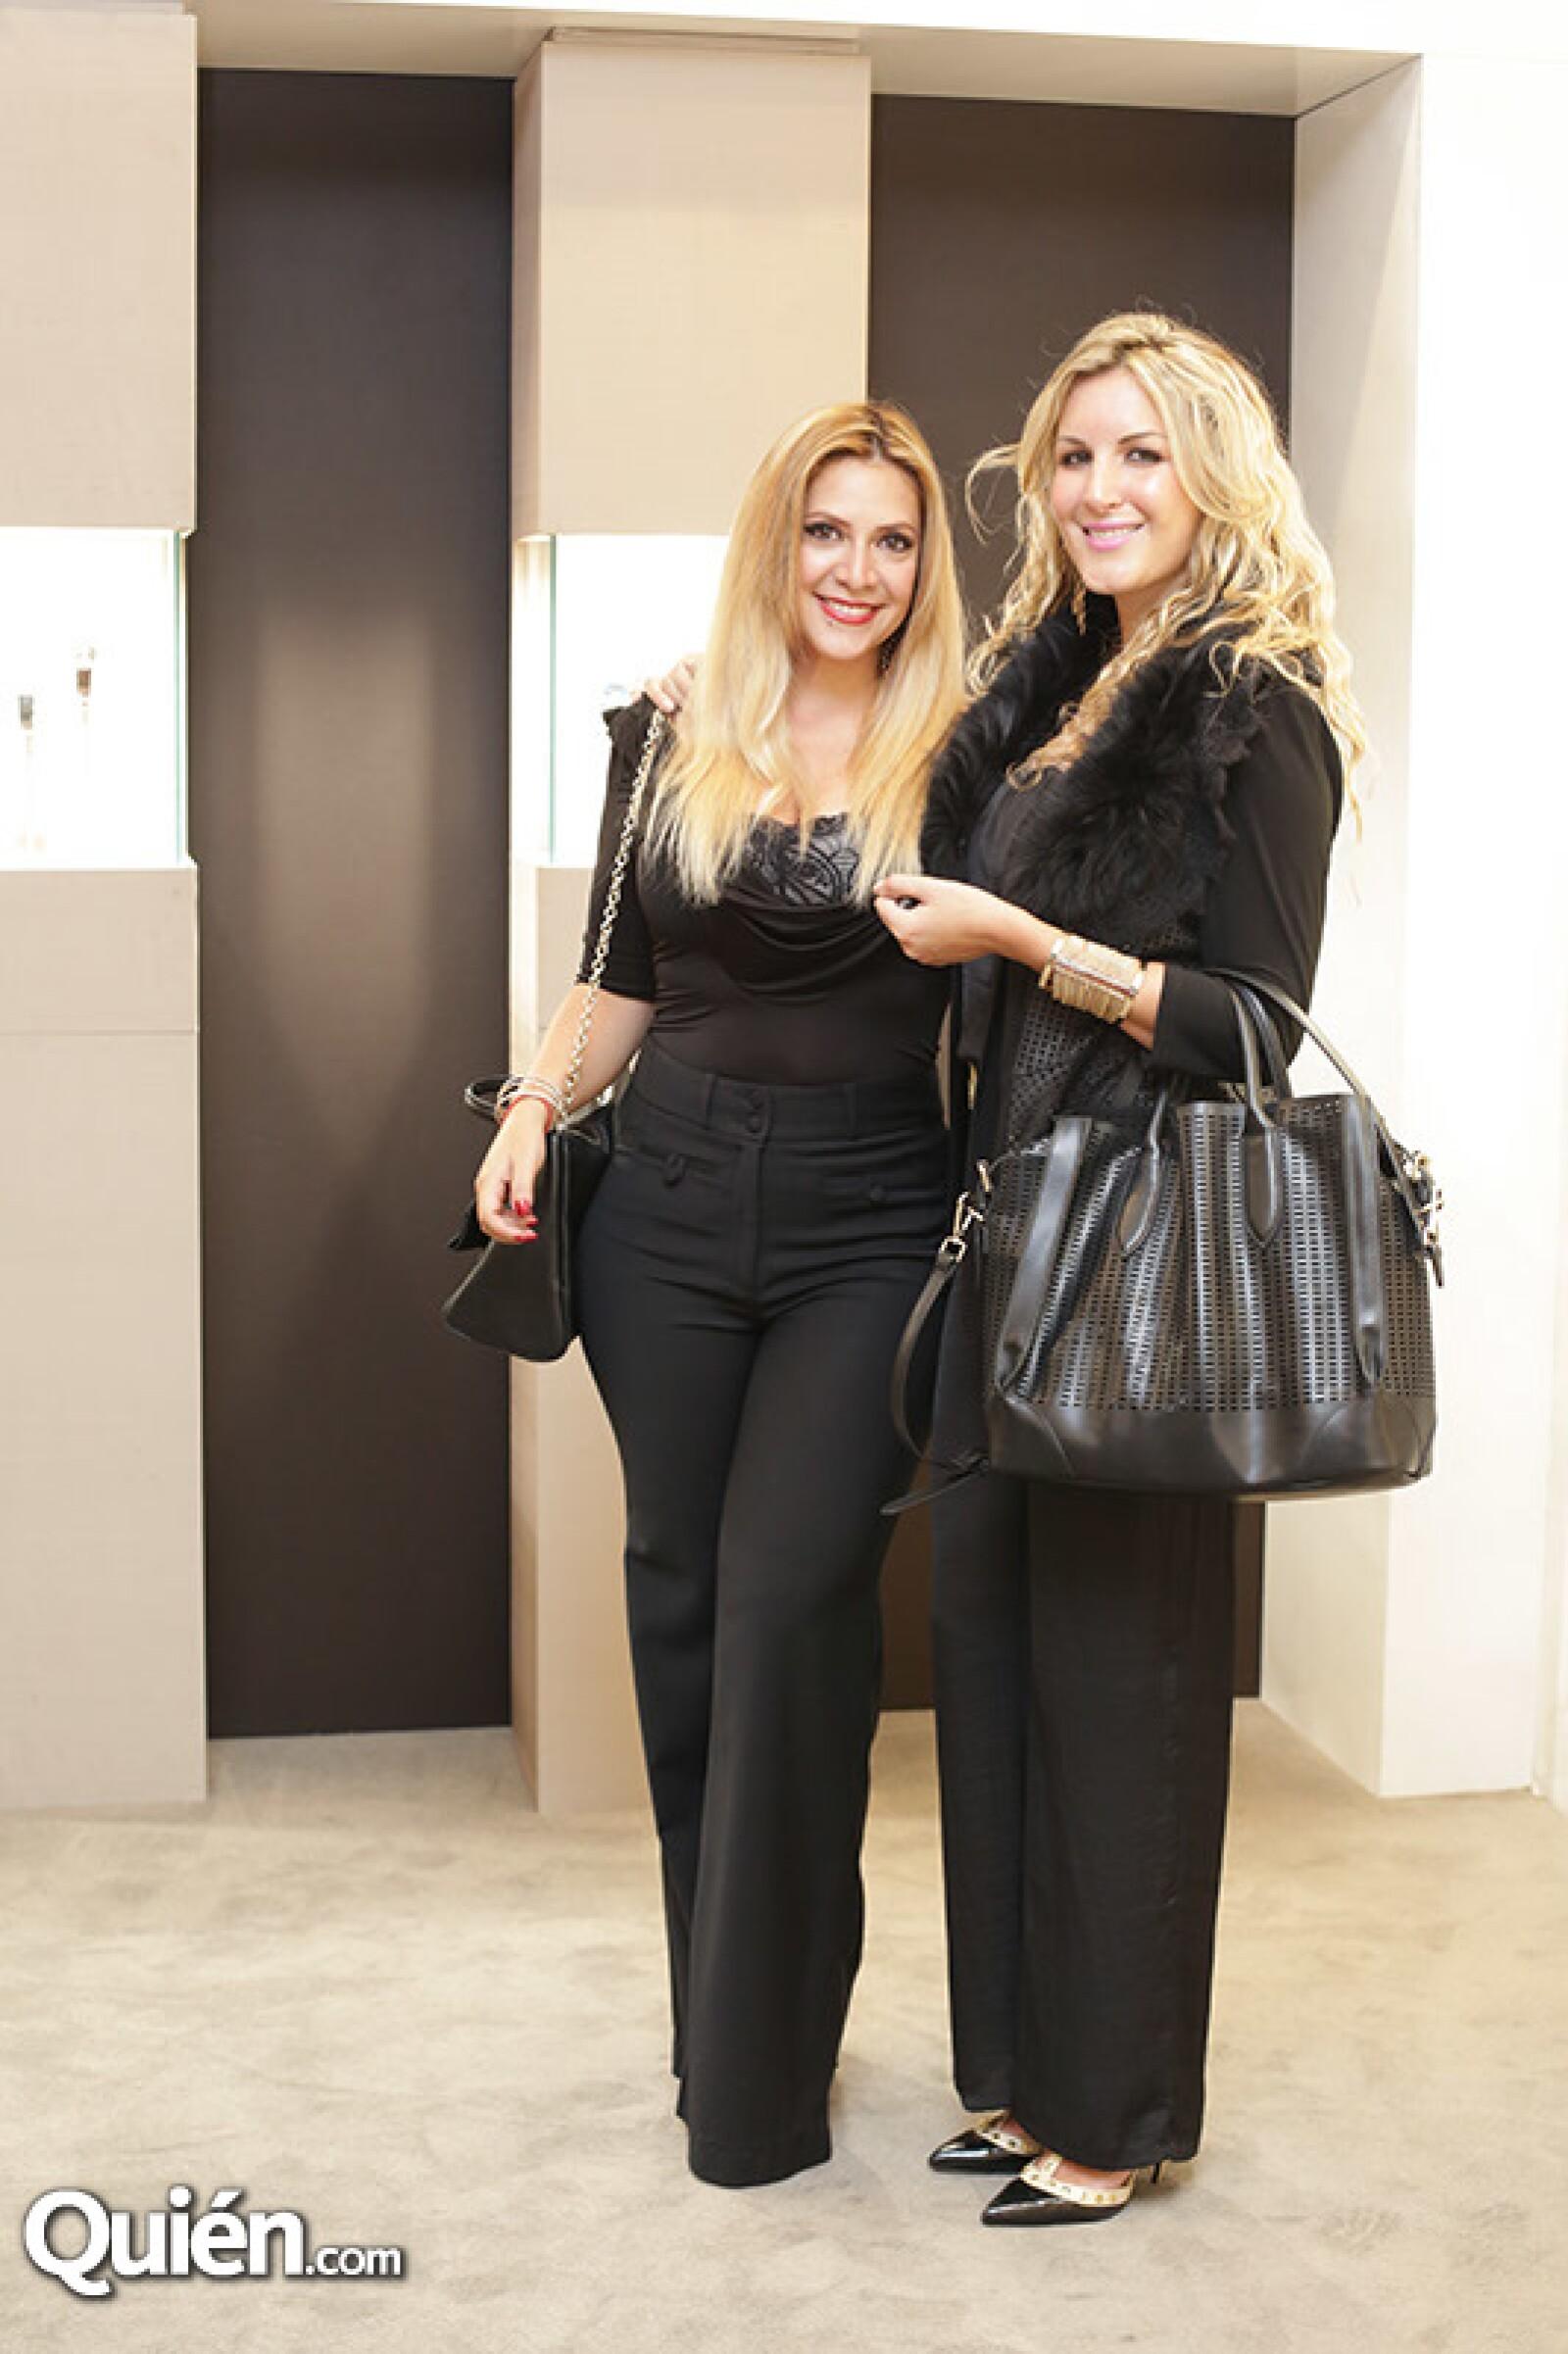 Alejandra Atala y Lili Lamadrid